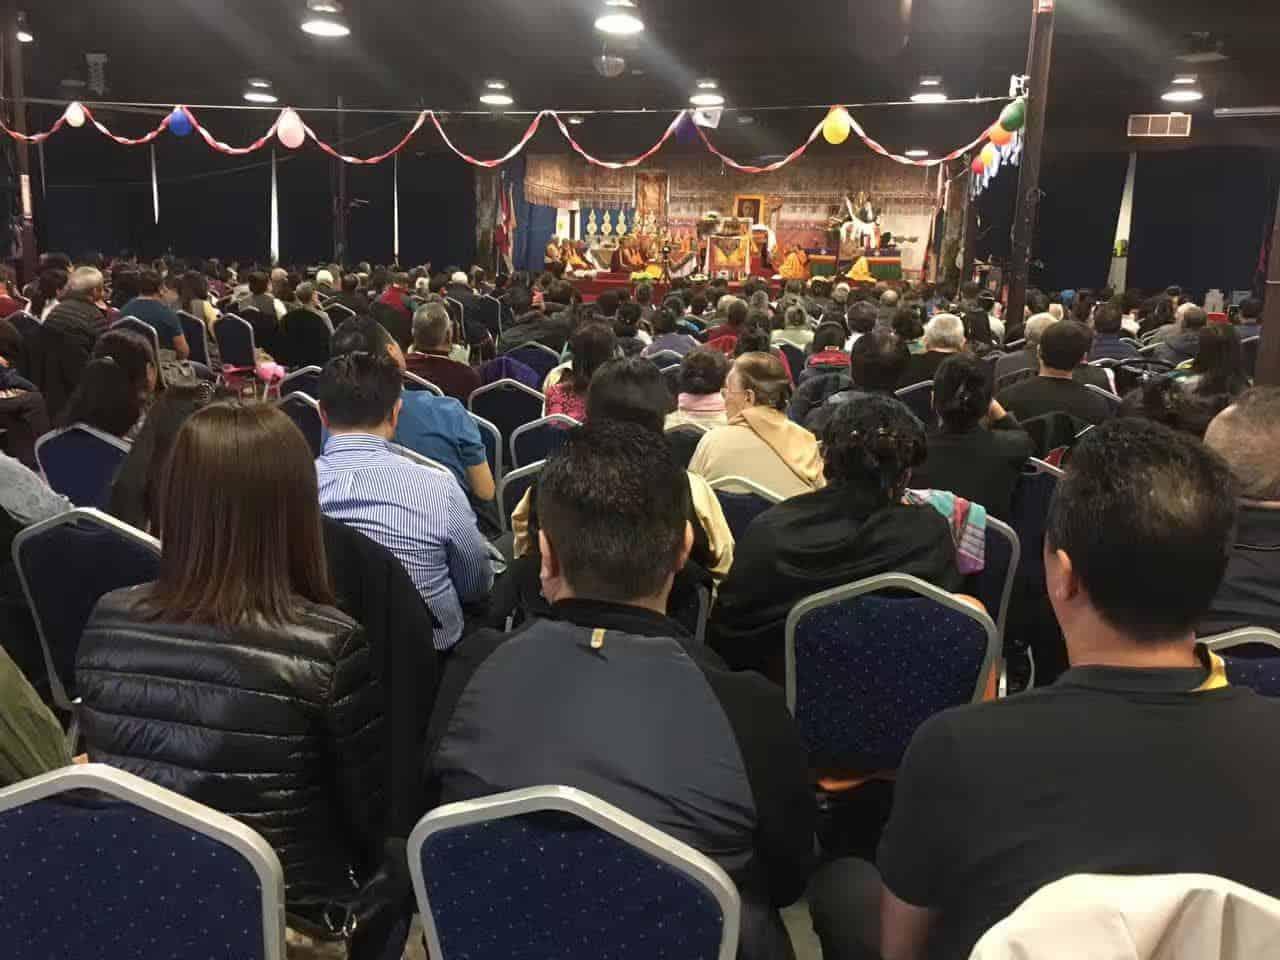 Gosok Rinpoche Toronto 2017-04 006 ded41b7ee799835f3e76943f1621300